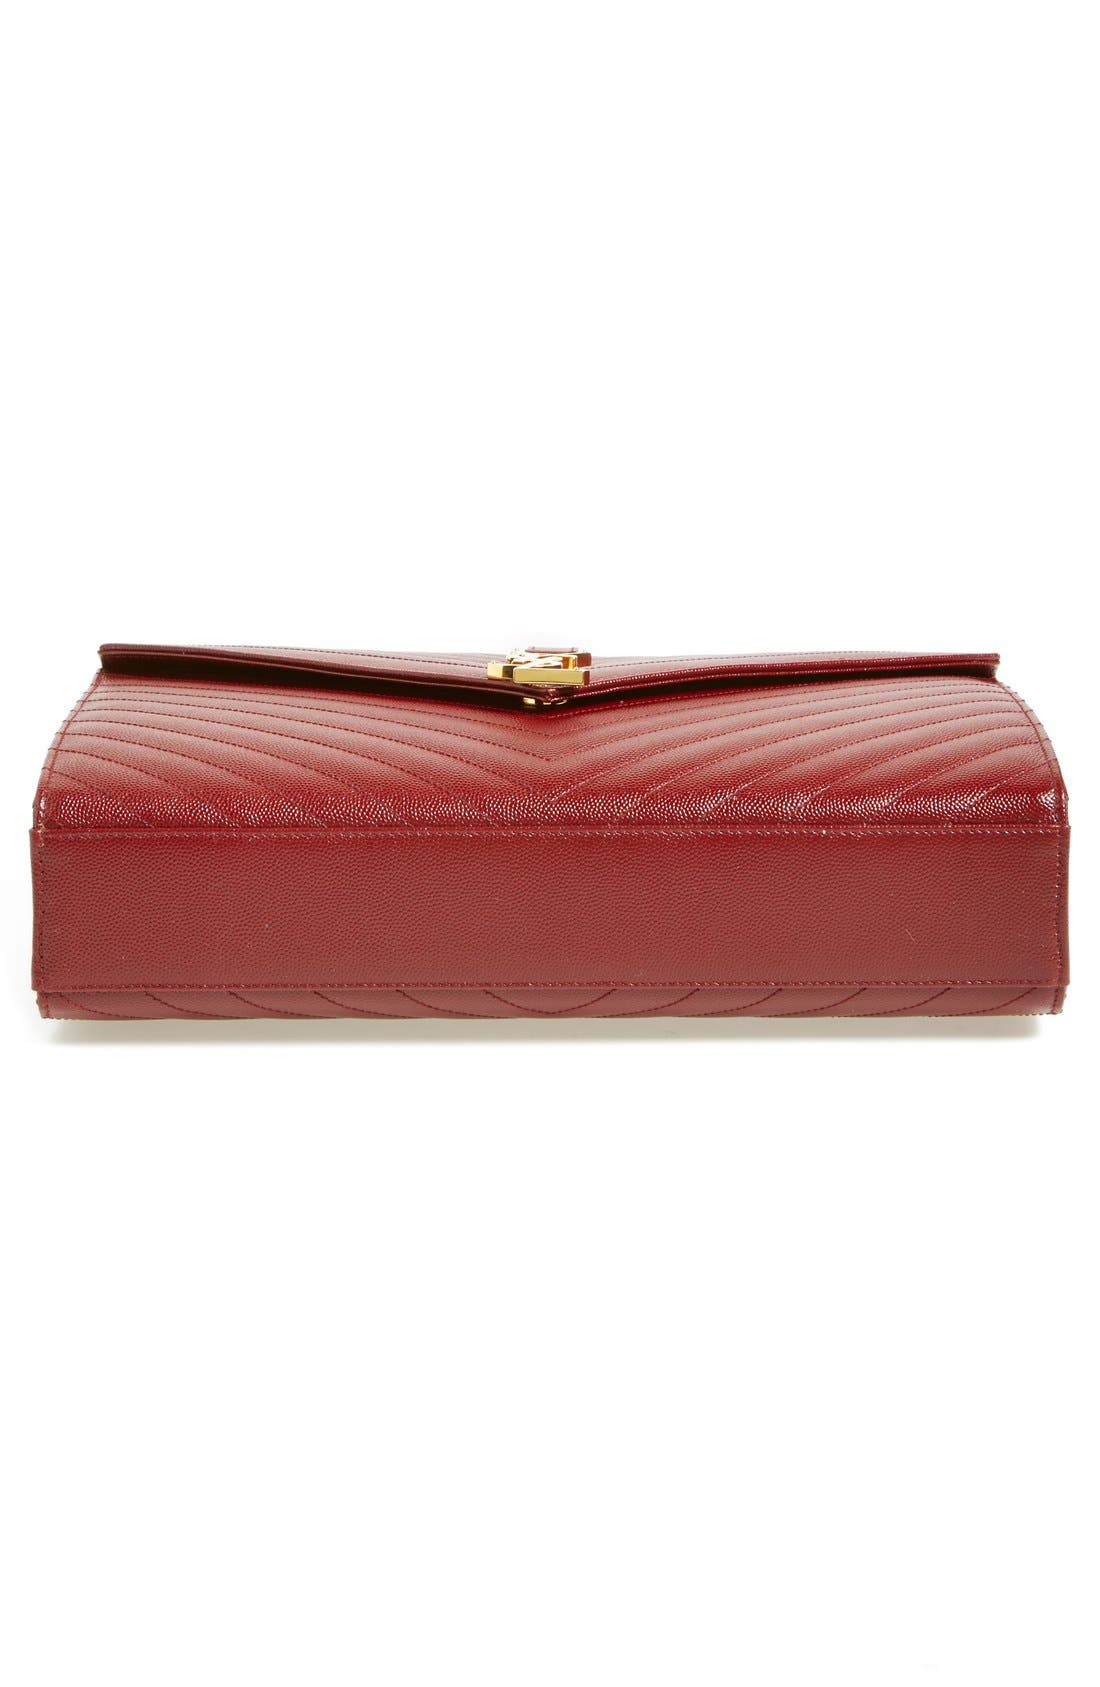 ,                             'Large Monogram' Grained Leather Shoulder Bag,                             Alternate thumbnail 56, color,                             930